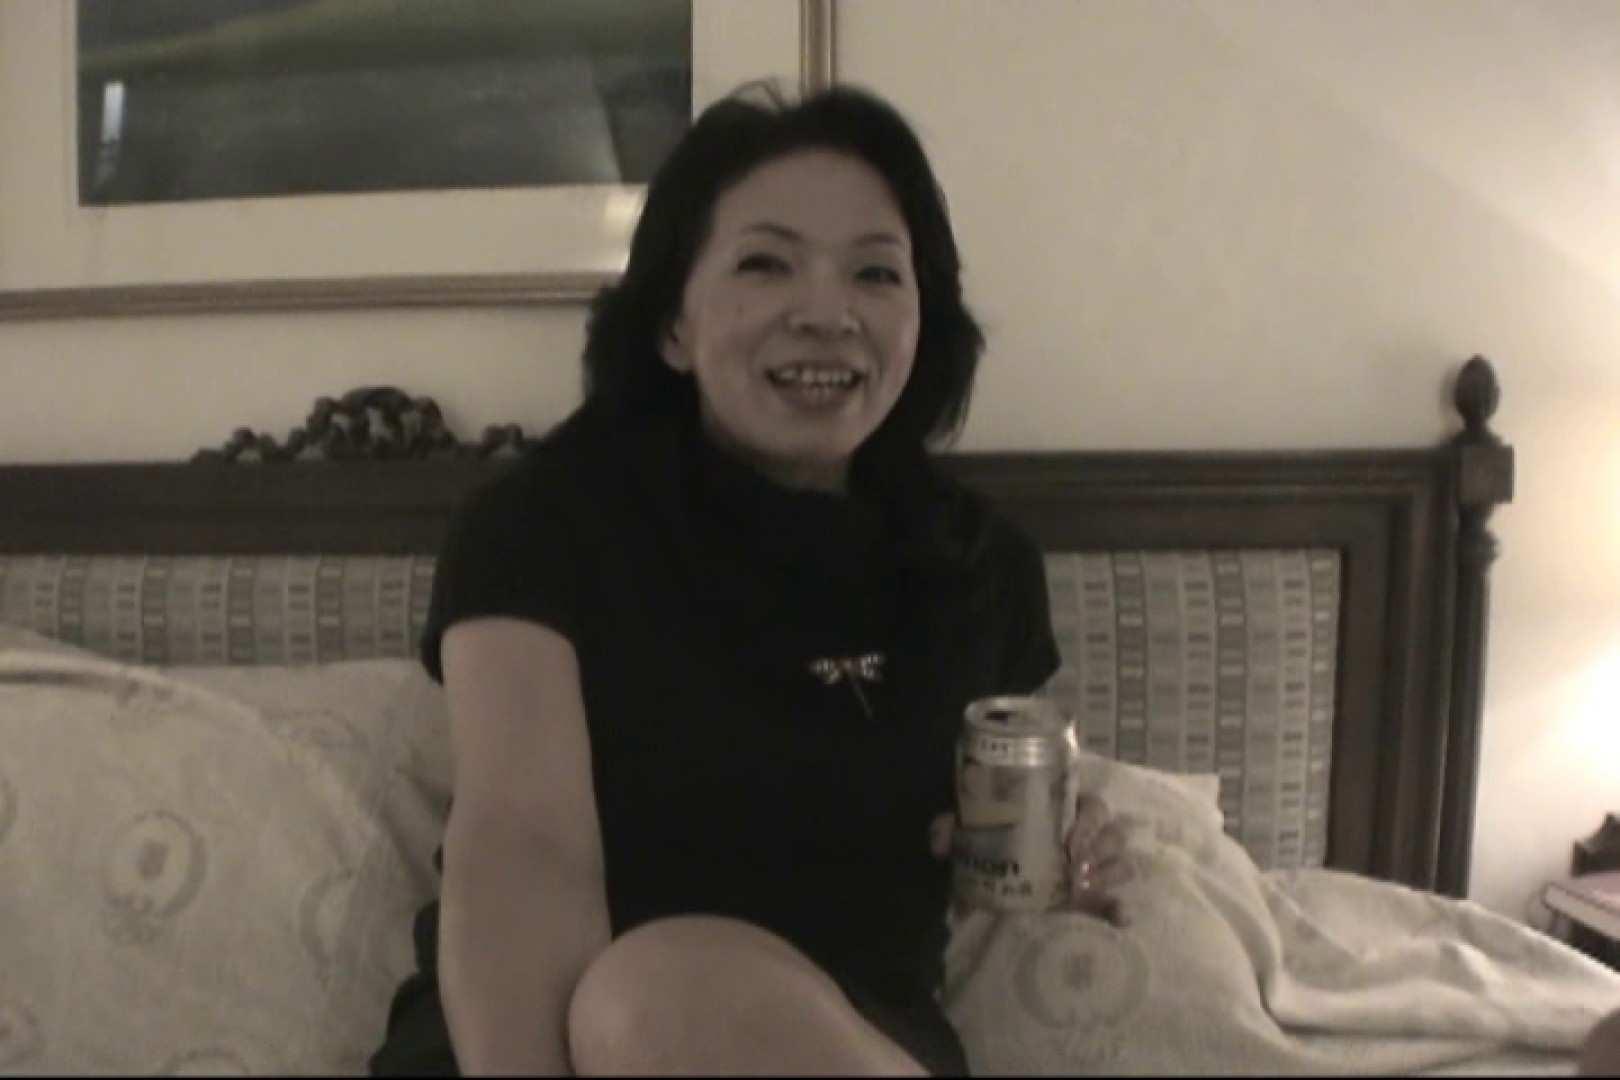 巨乳 乳首:性欲全開、全身性感帯宇宙人~江本さゆり~:大奥